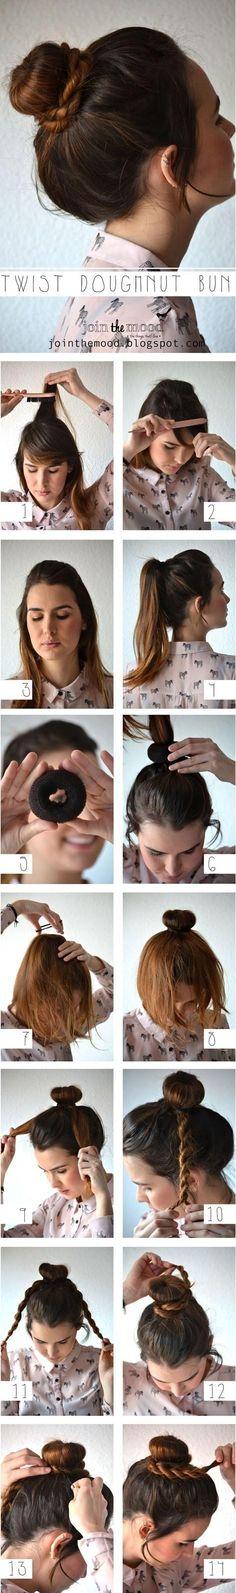 DIY Twist Doughnut Bun Hairstyle DIY Twist Doughnut Bun Hairstyle